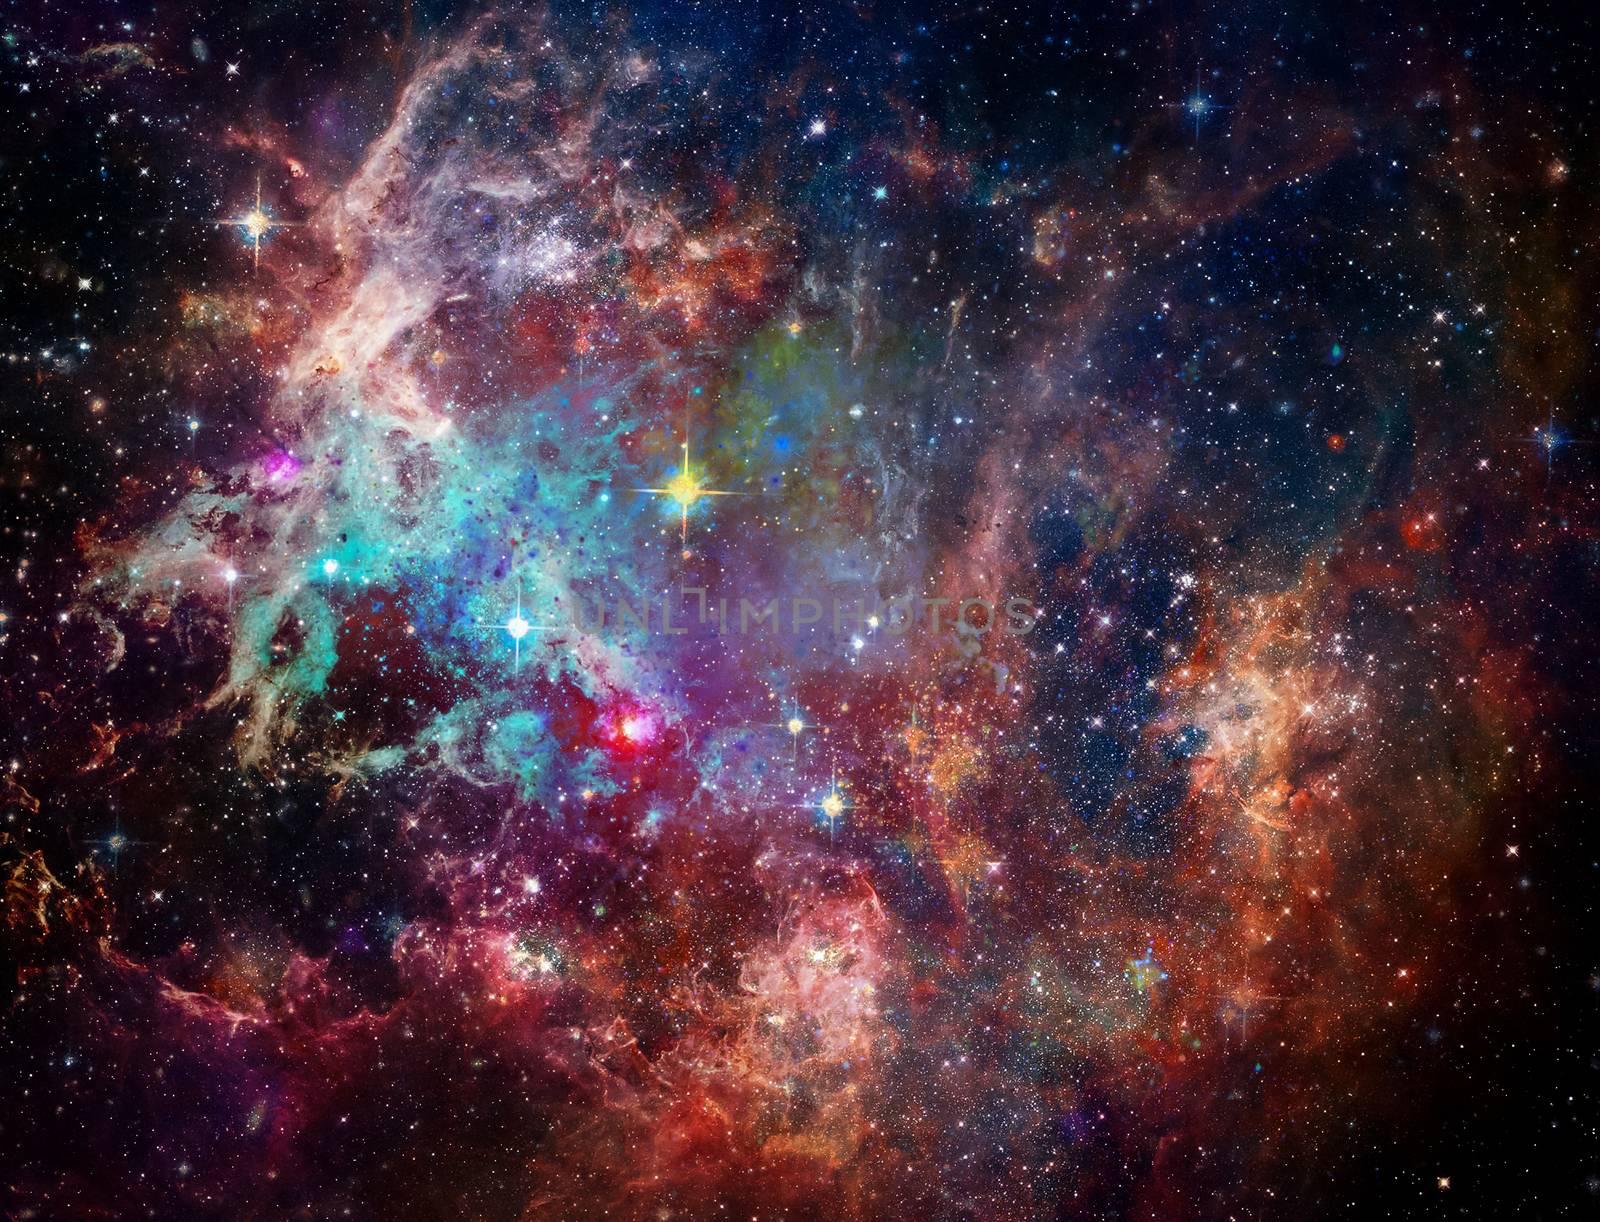 Big Babies in the Rosette Nebula. Vivid space